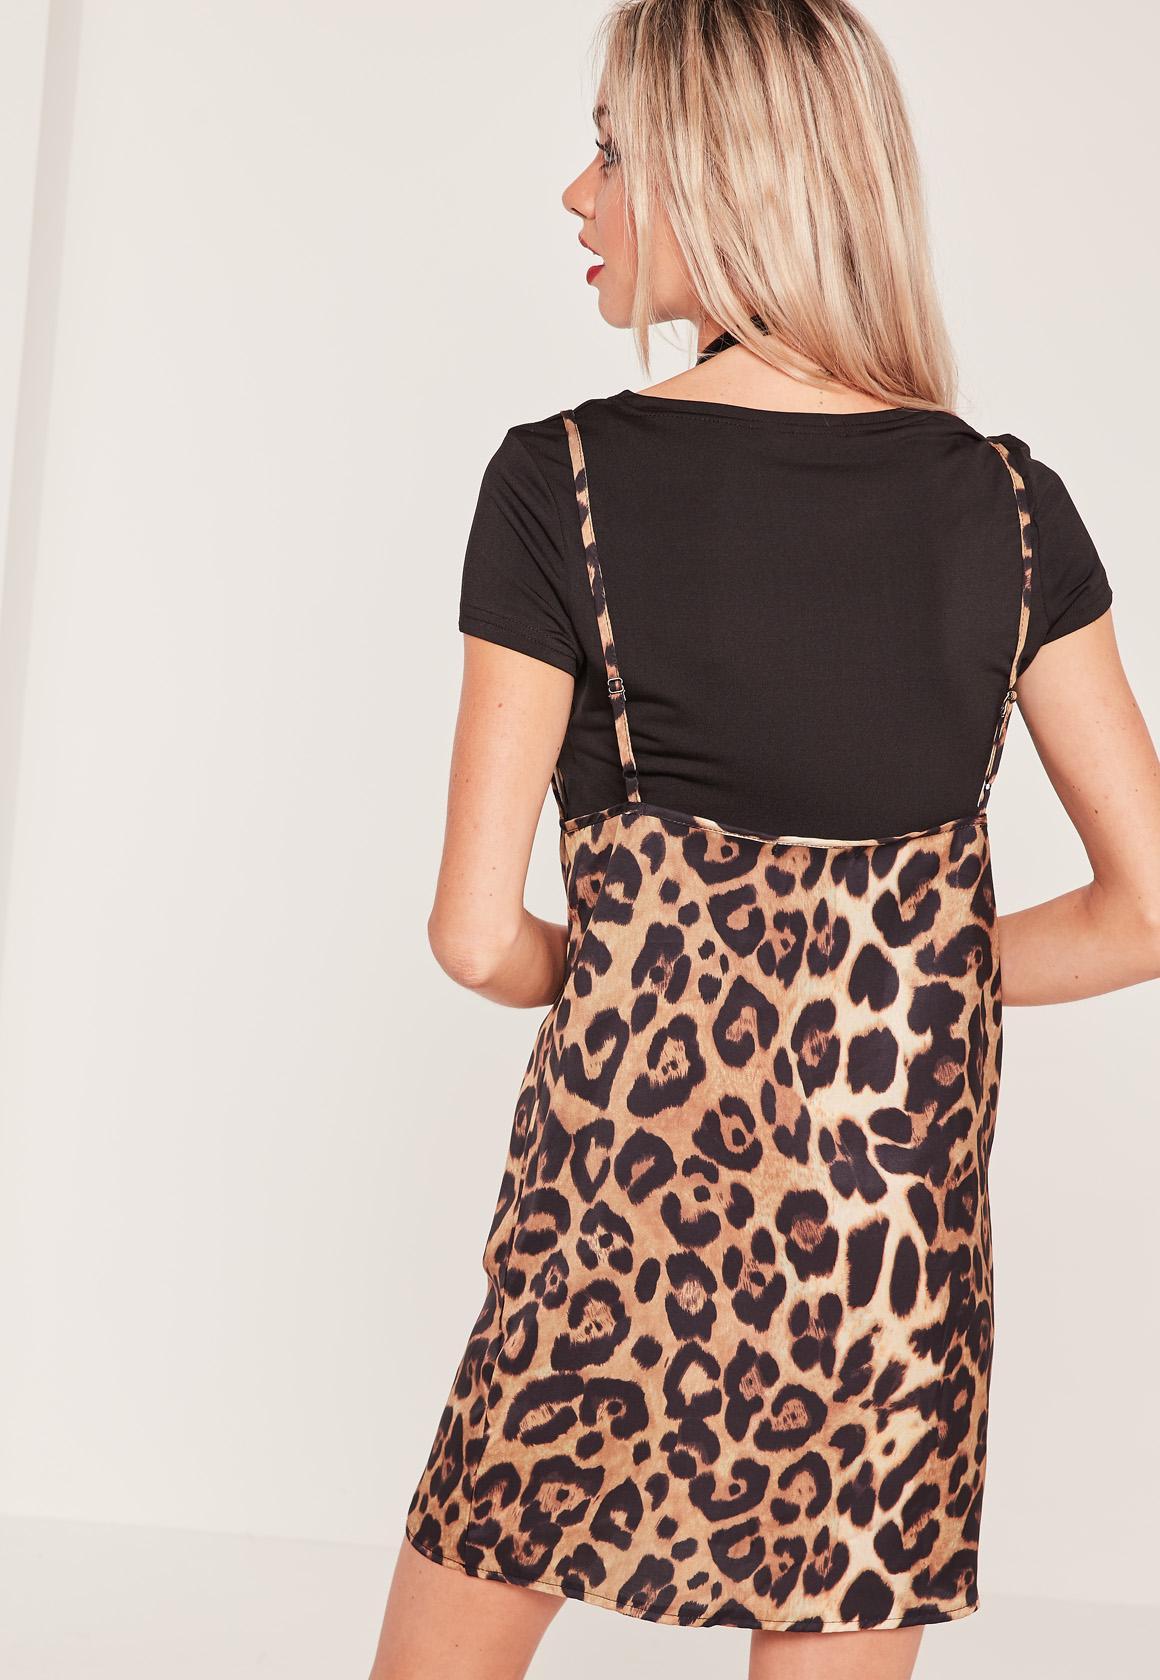 Leopard Print 2 in 1 Dress Black